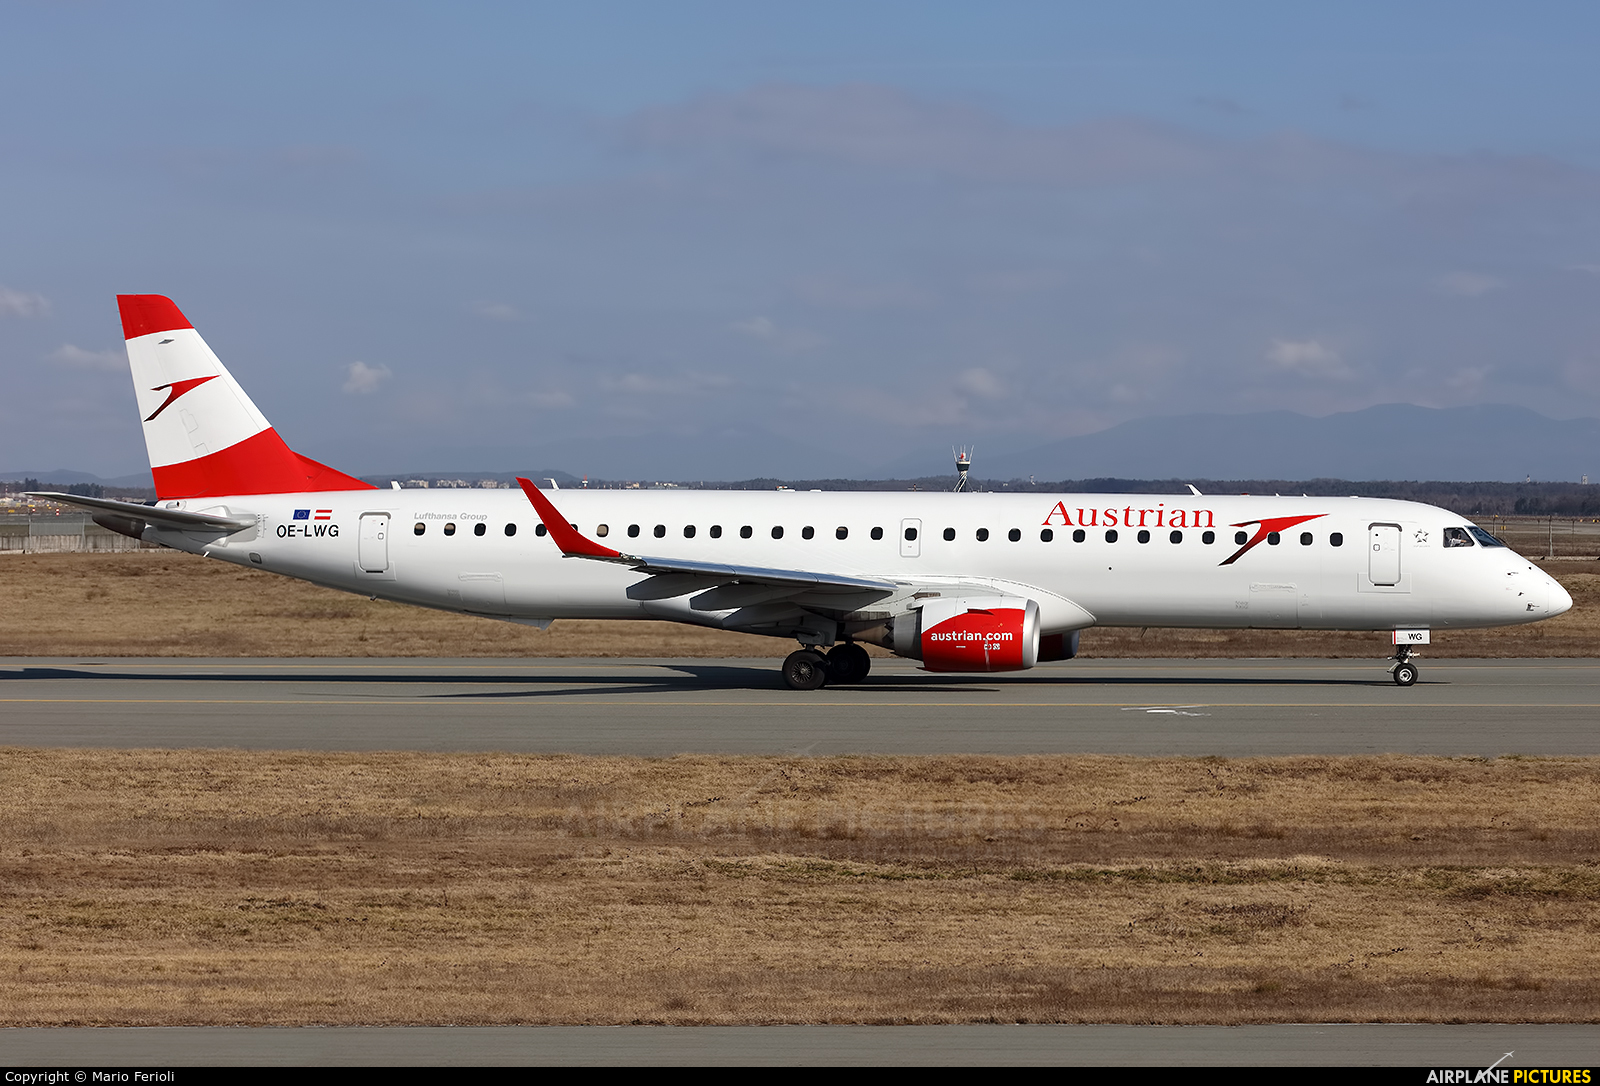 Austrian Airlines/Arrows/Tyrolean OE-LWG aircraft at Milan - Malpensa